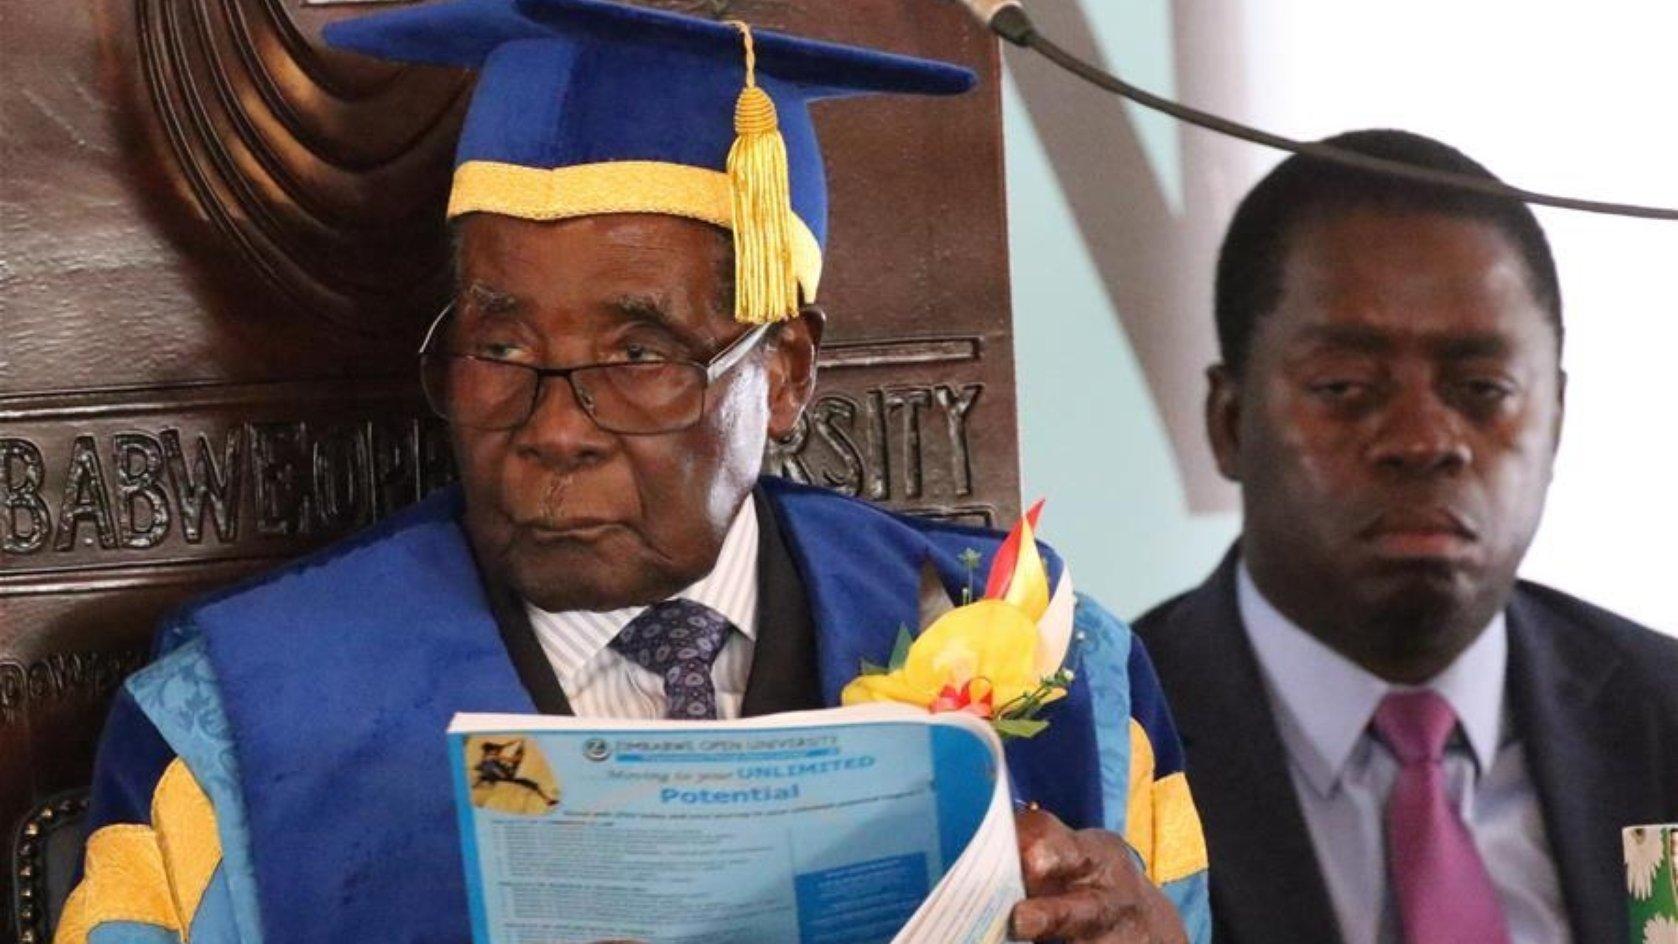 Zimbabwe's President Robert Mugabe officiates at a graduation ceremony of Zimbabwe Open University in Harare, capital of Zimbabwe on Nov. 17, 2017. (Xinhua)